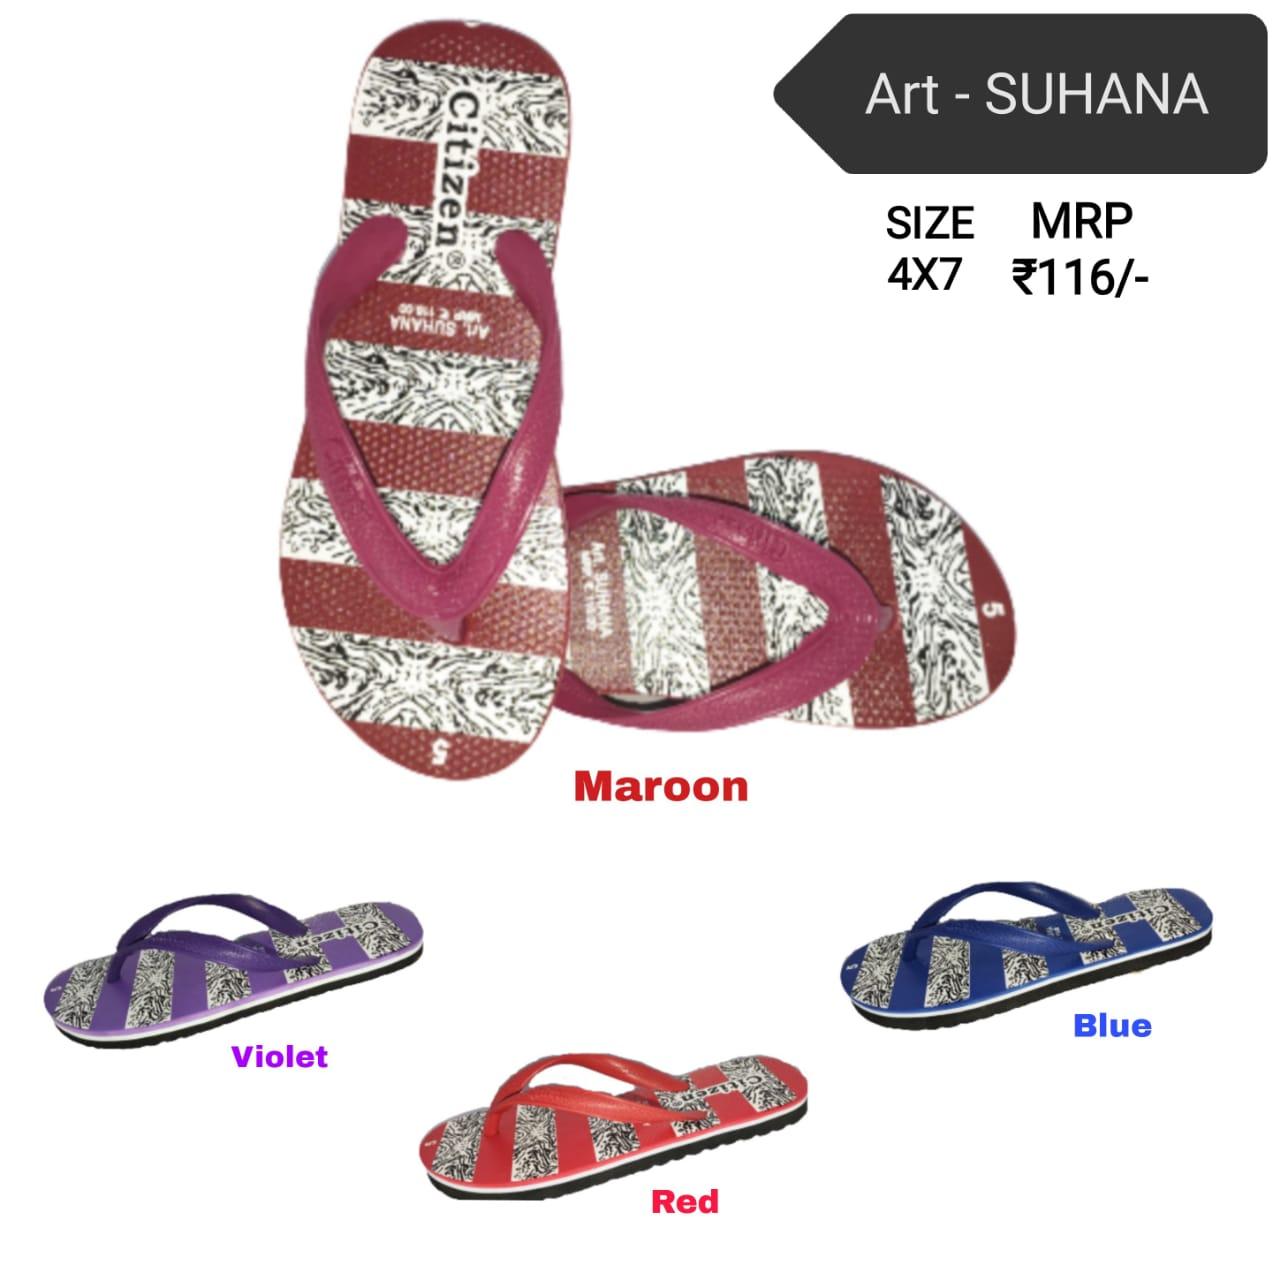 Citizen ladies hawai - suhana ladies slippers